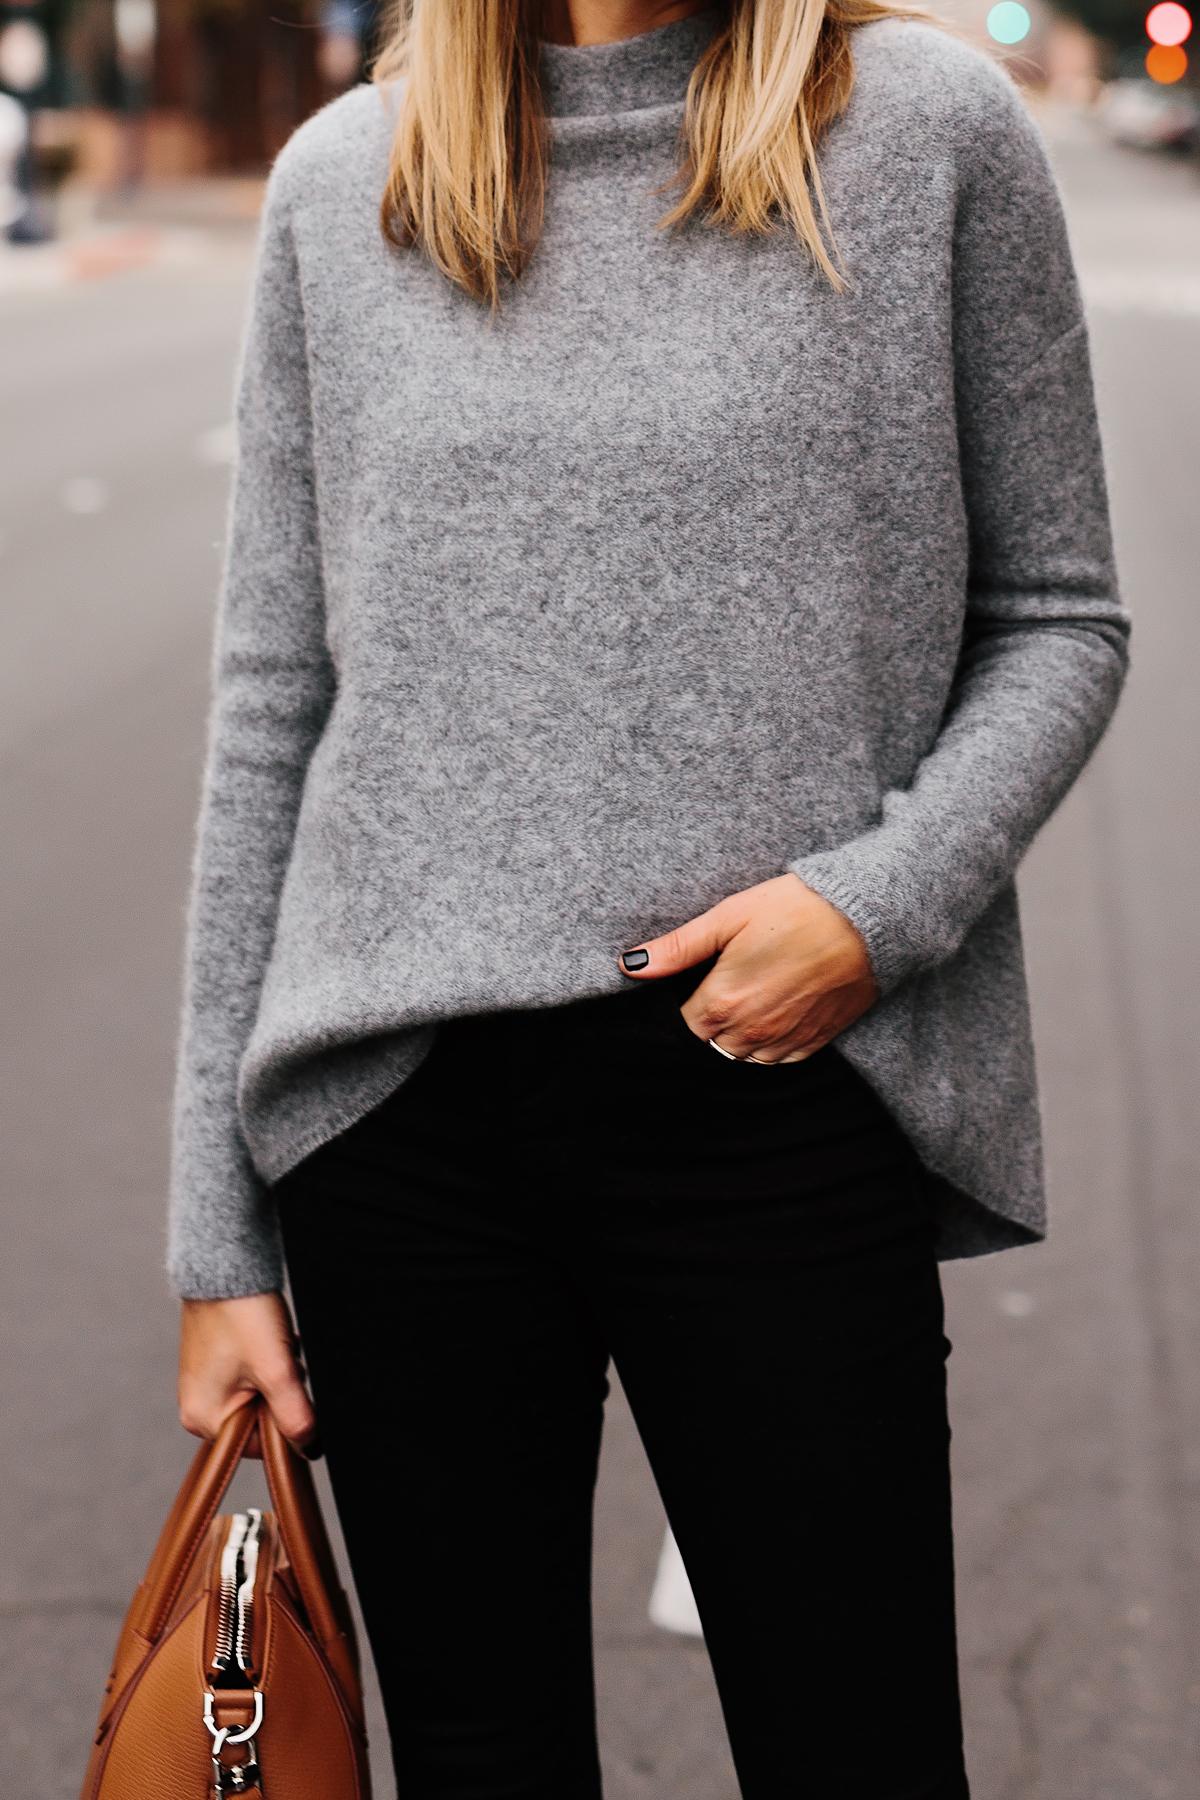 Fashion Jackson Bloomingdales Grey Cashmere Mock Neck Sweater Black Skinny Jeans Tan Handbag